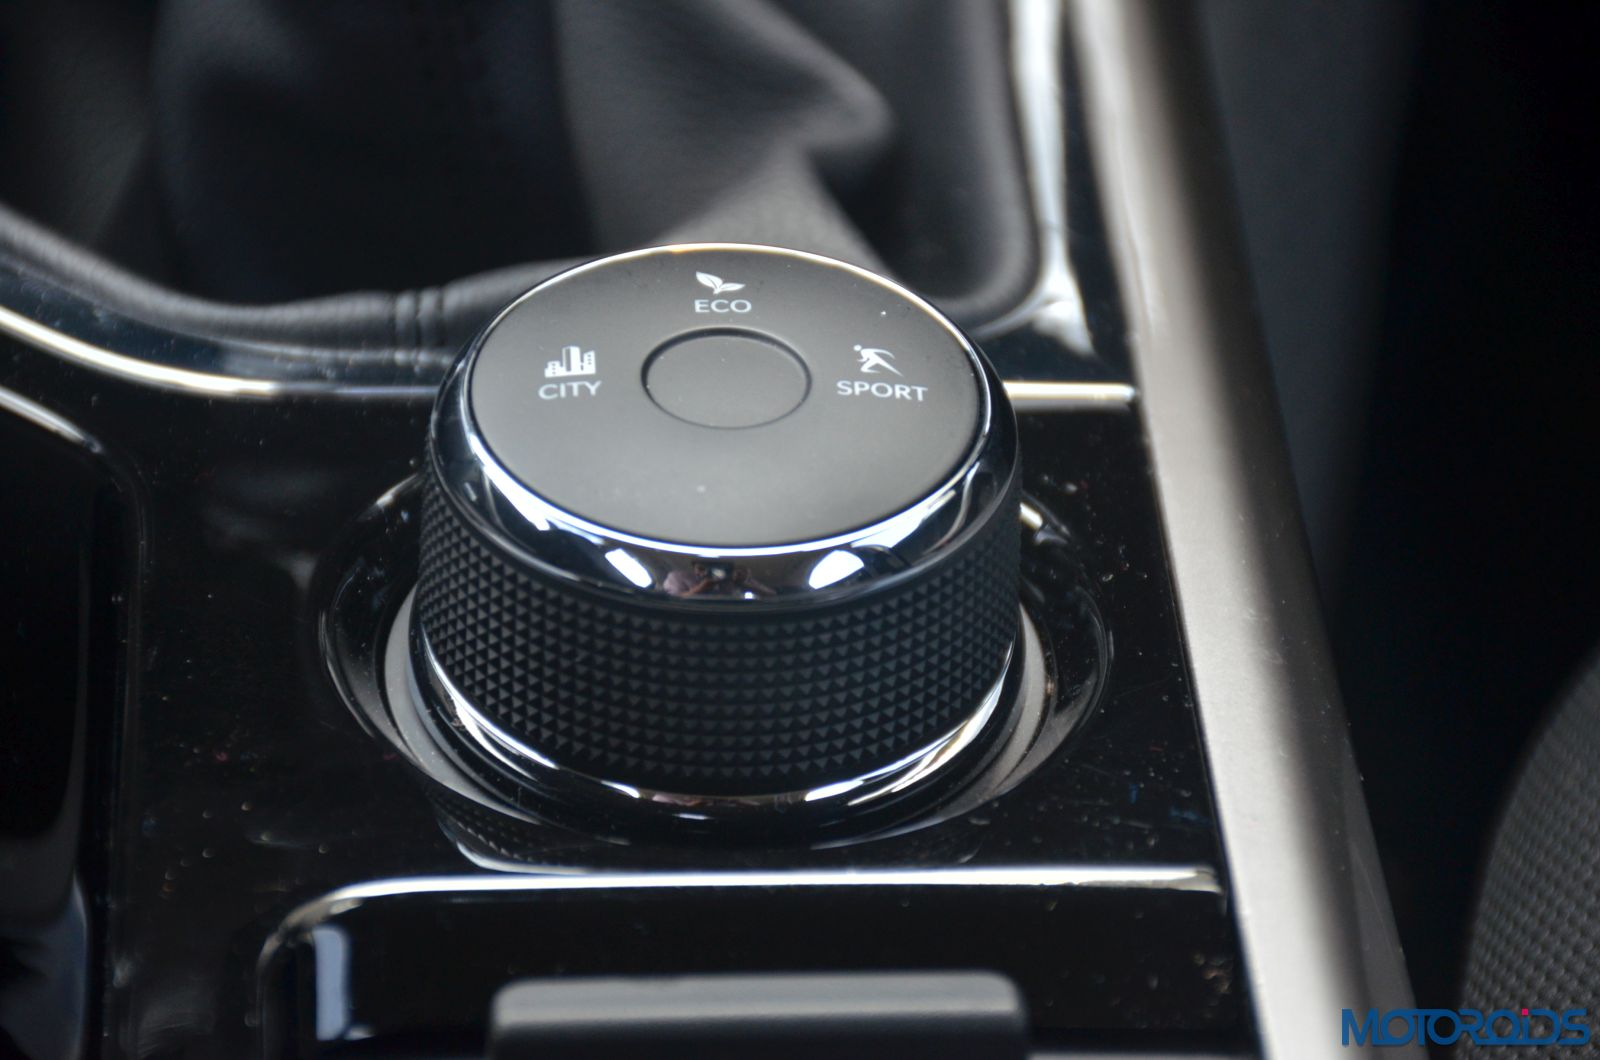 Tata-Nexon-drive-selector-dial